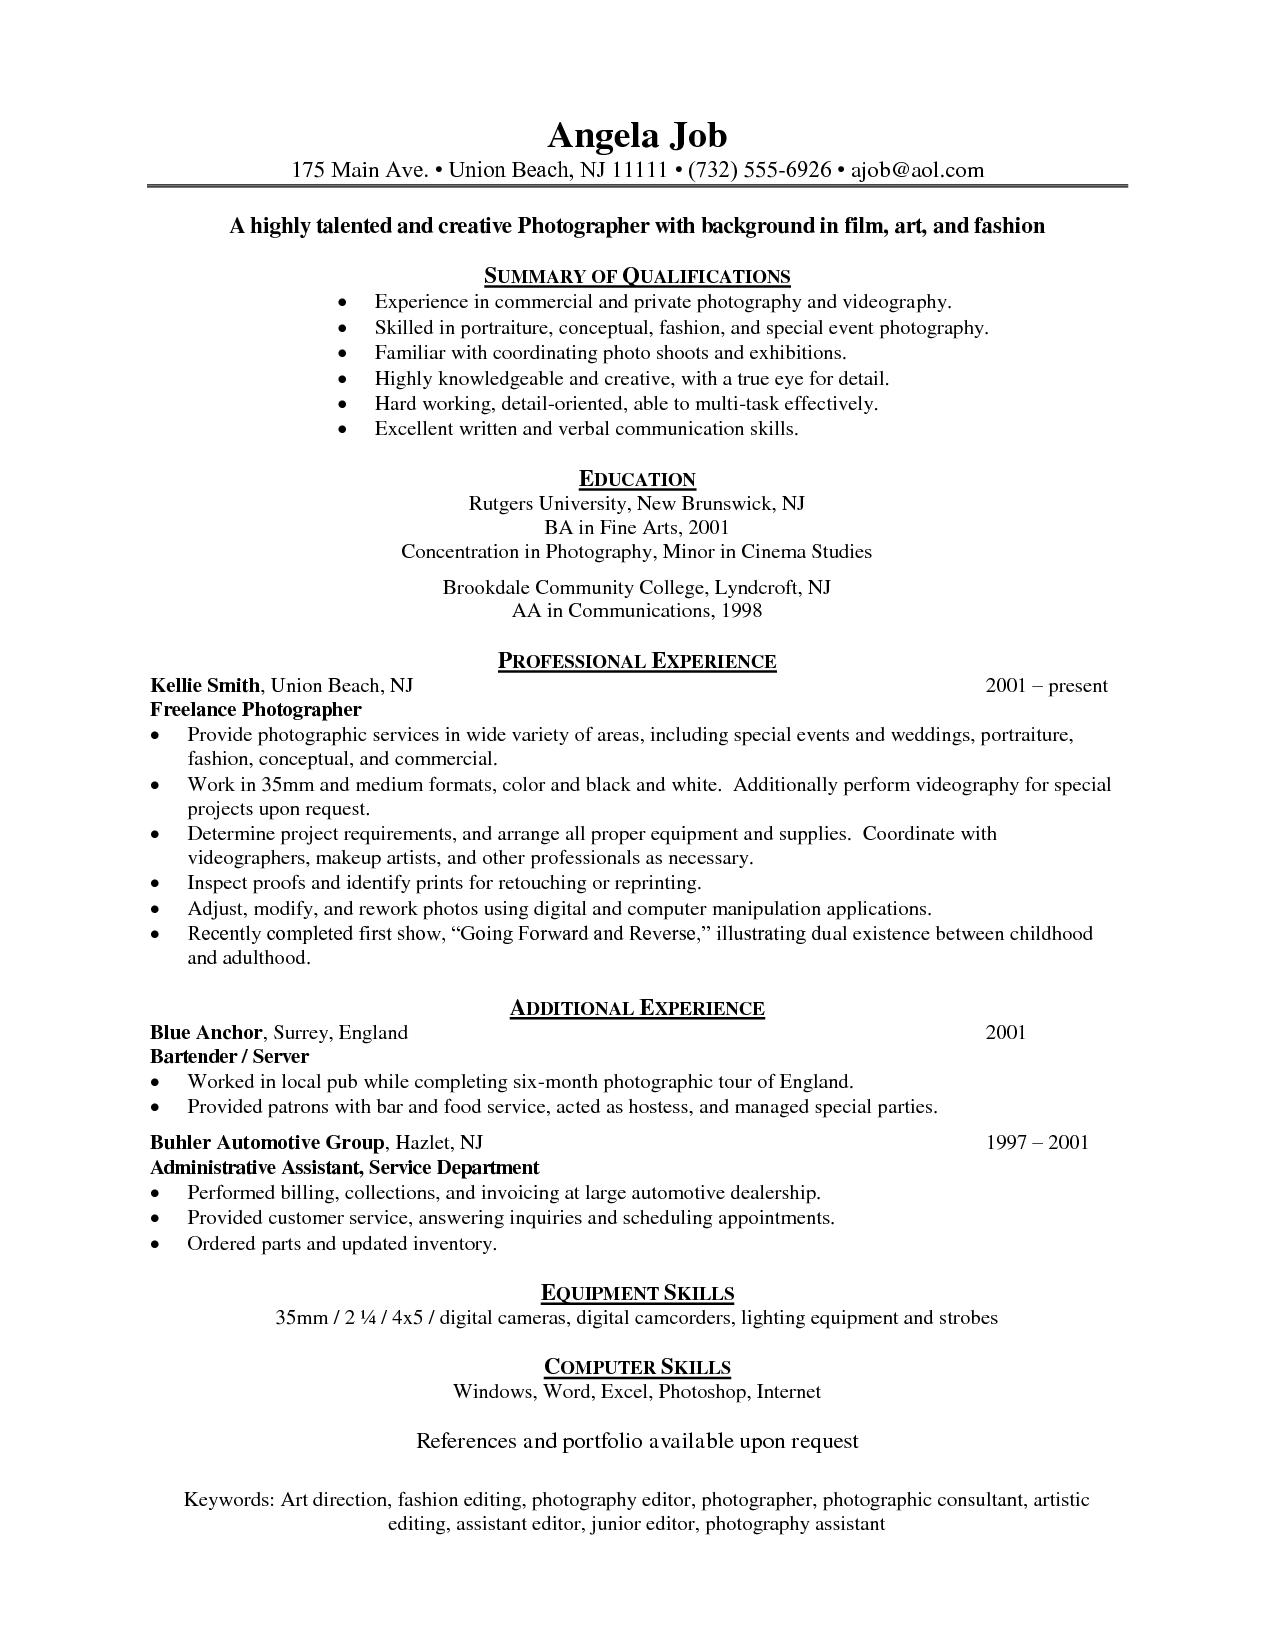 Autopsy Assistant Sample Resume] Pathologist Cv Matchboardco .